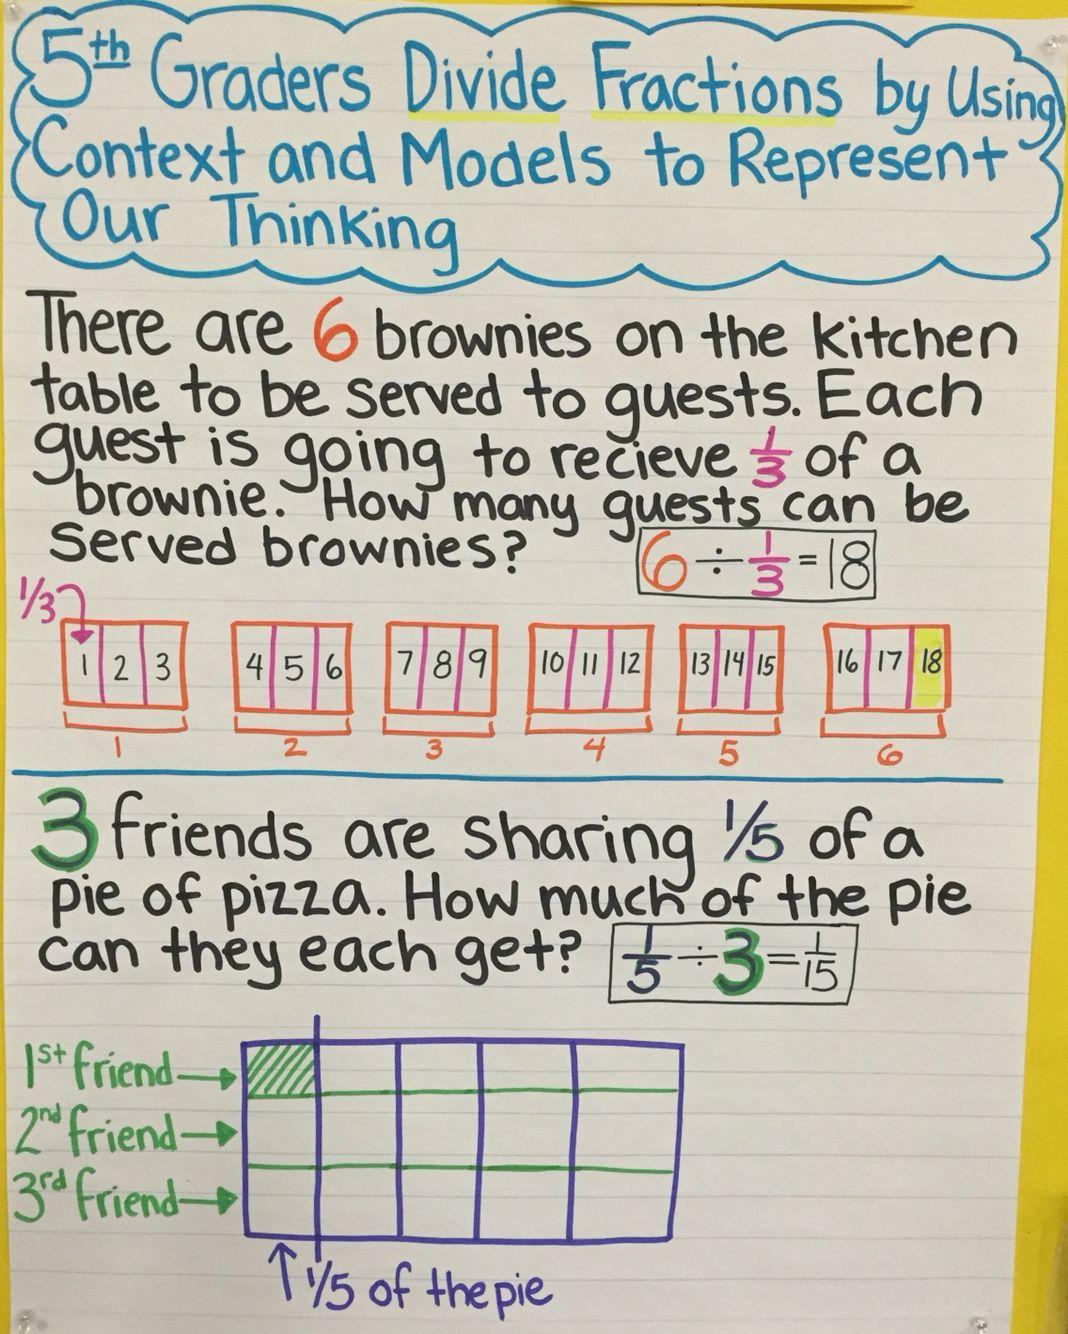 Dividing fractions          Math    Education   Fract